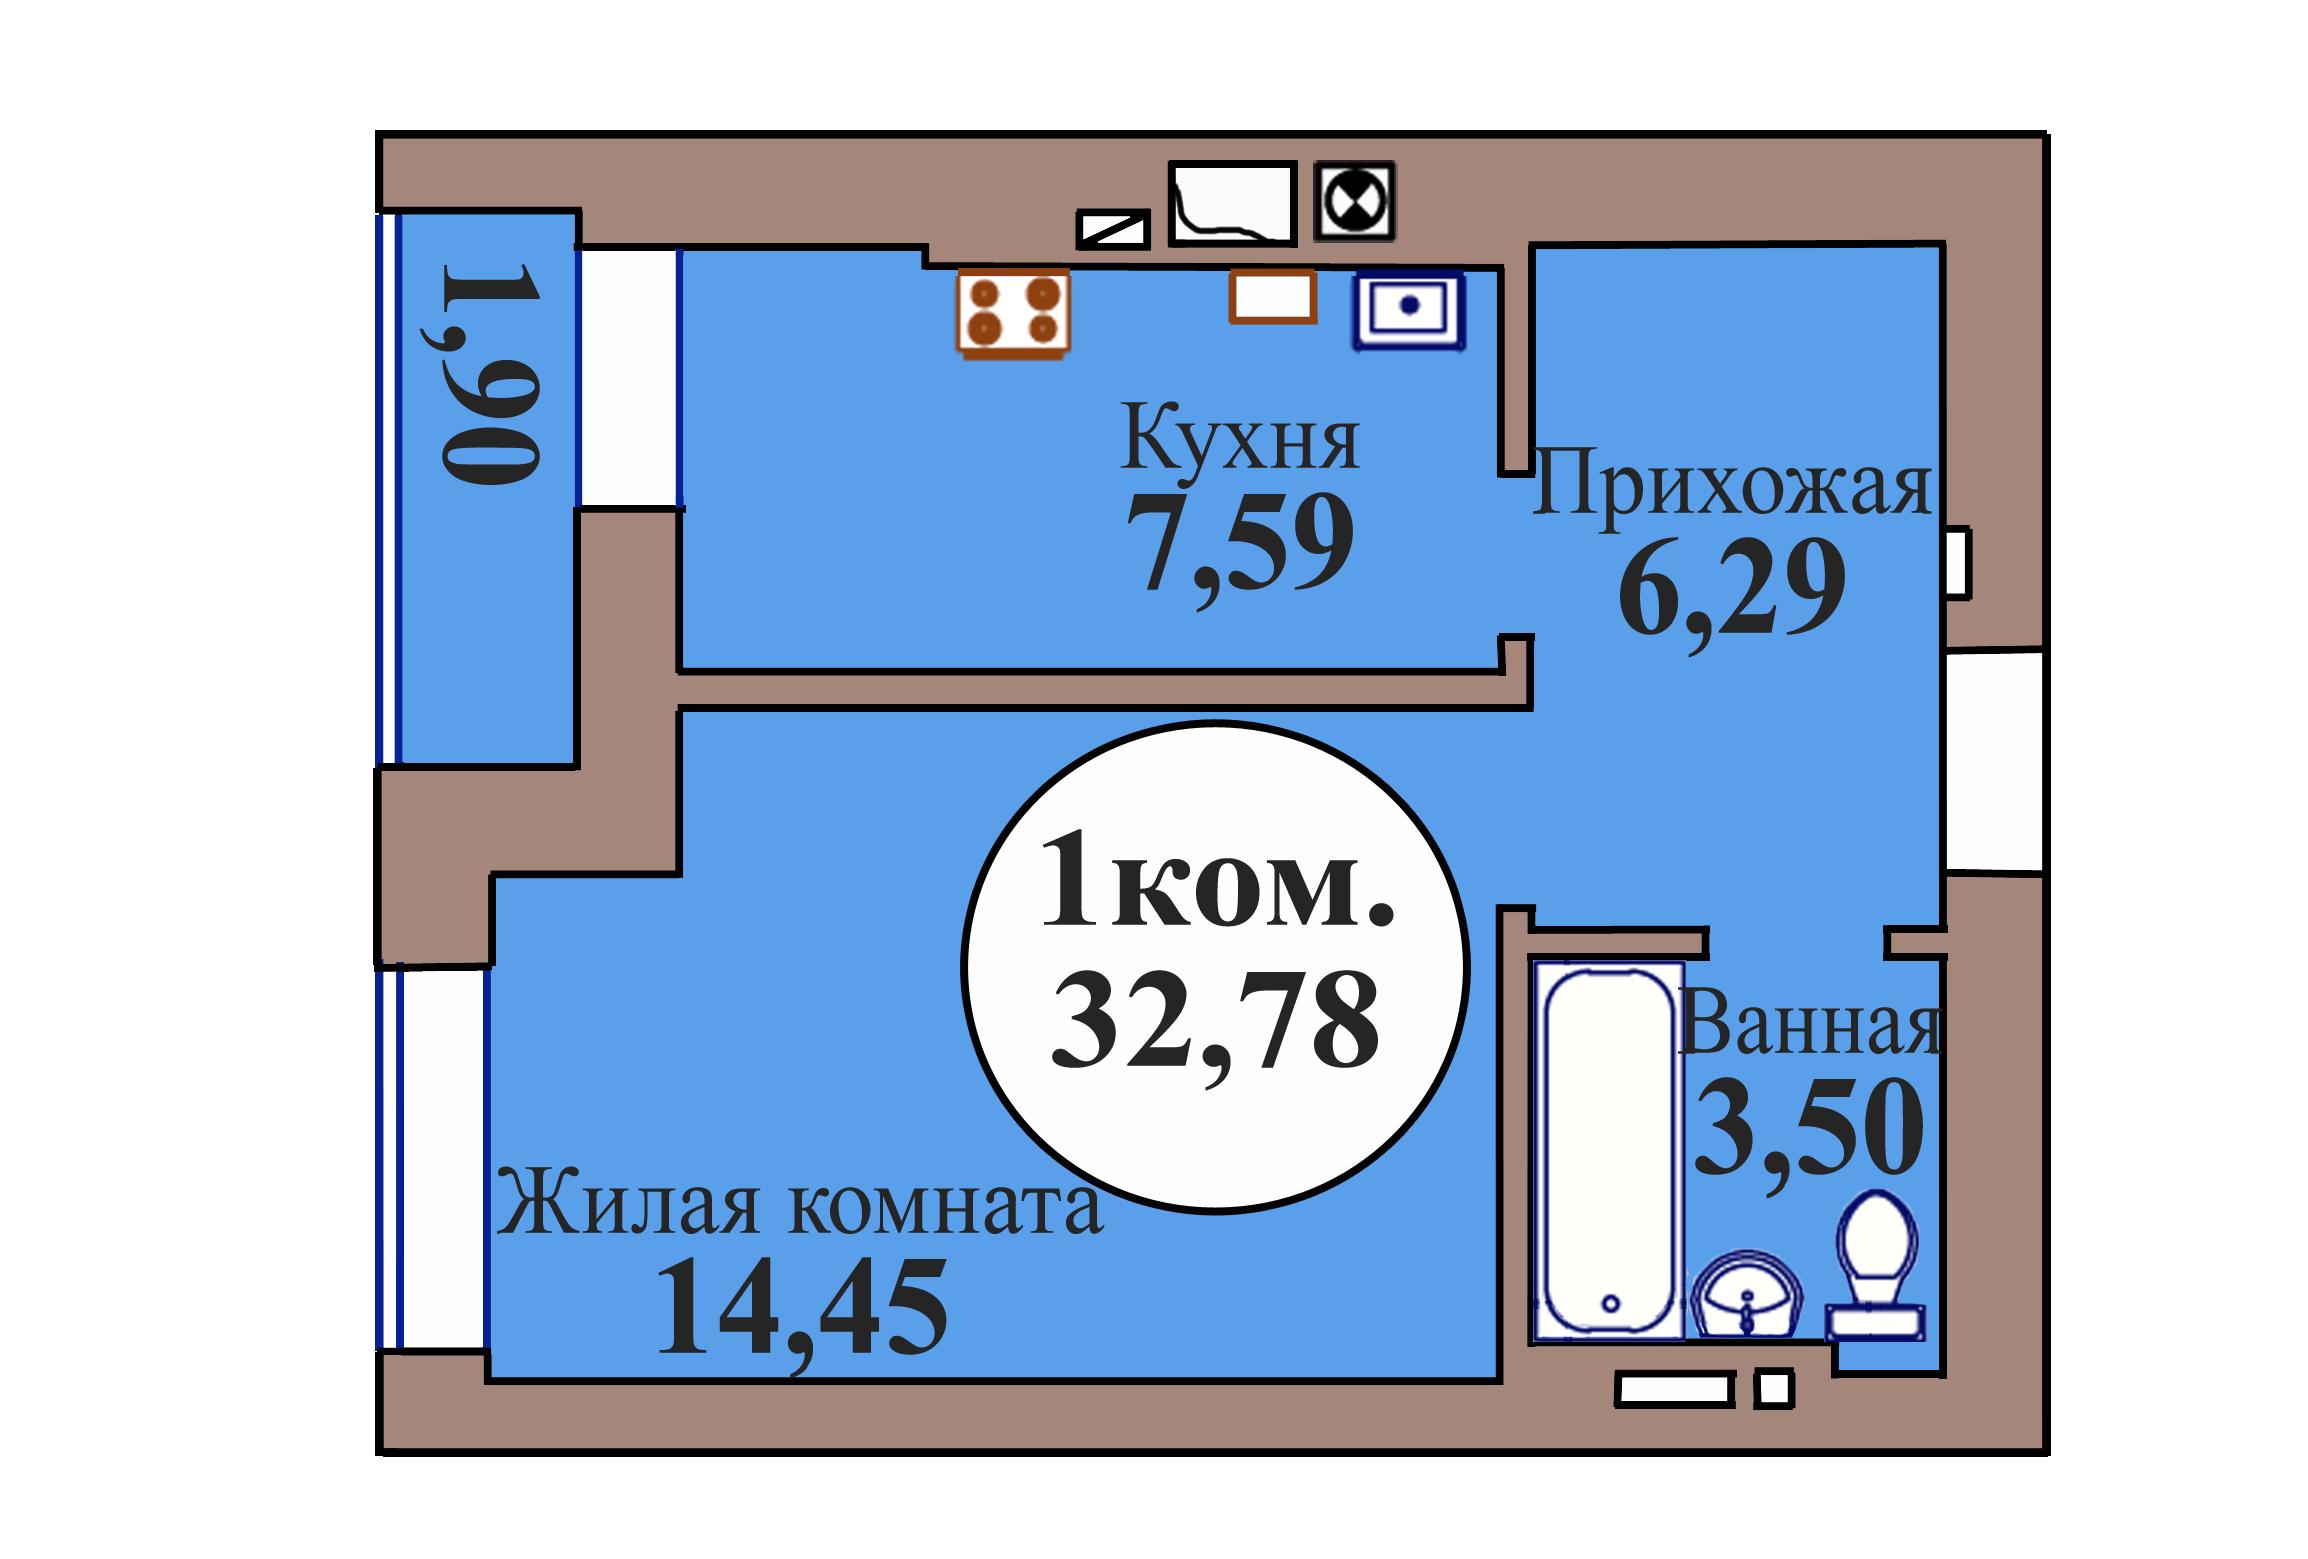 1-комн. кв. по пер. Калининградский, 5 кв. 62 в Калининграде